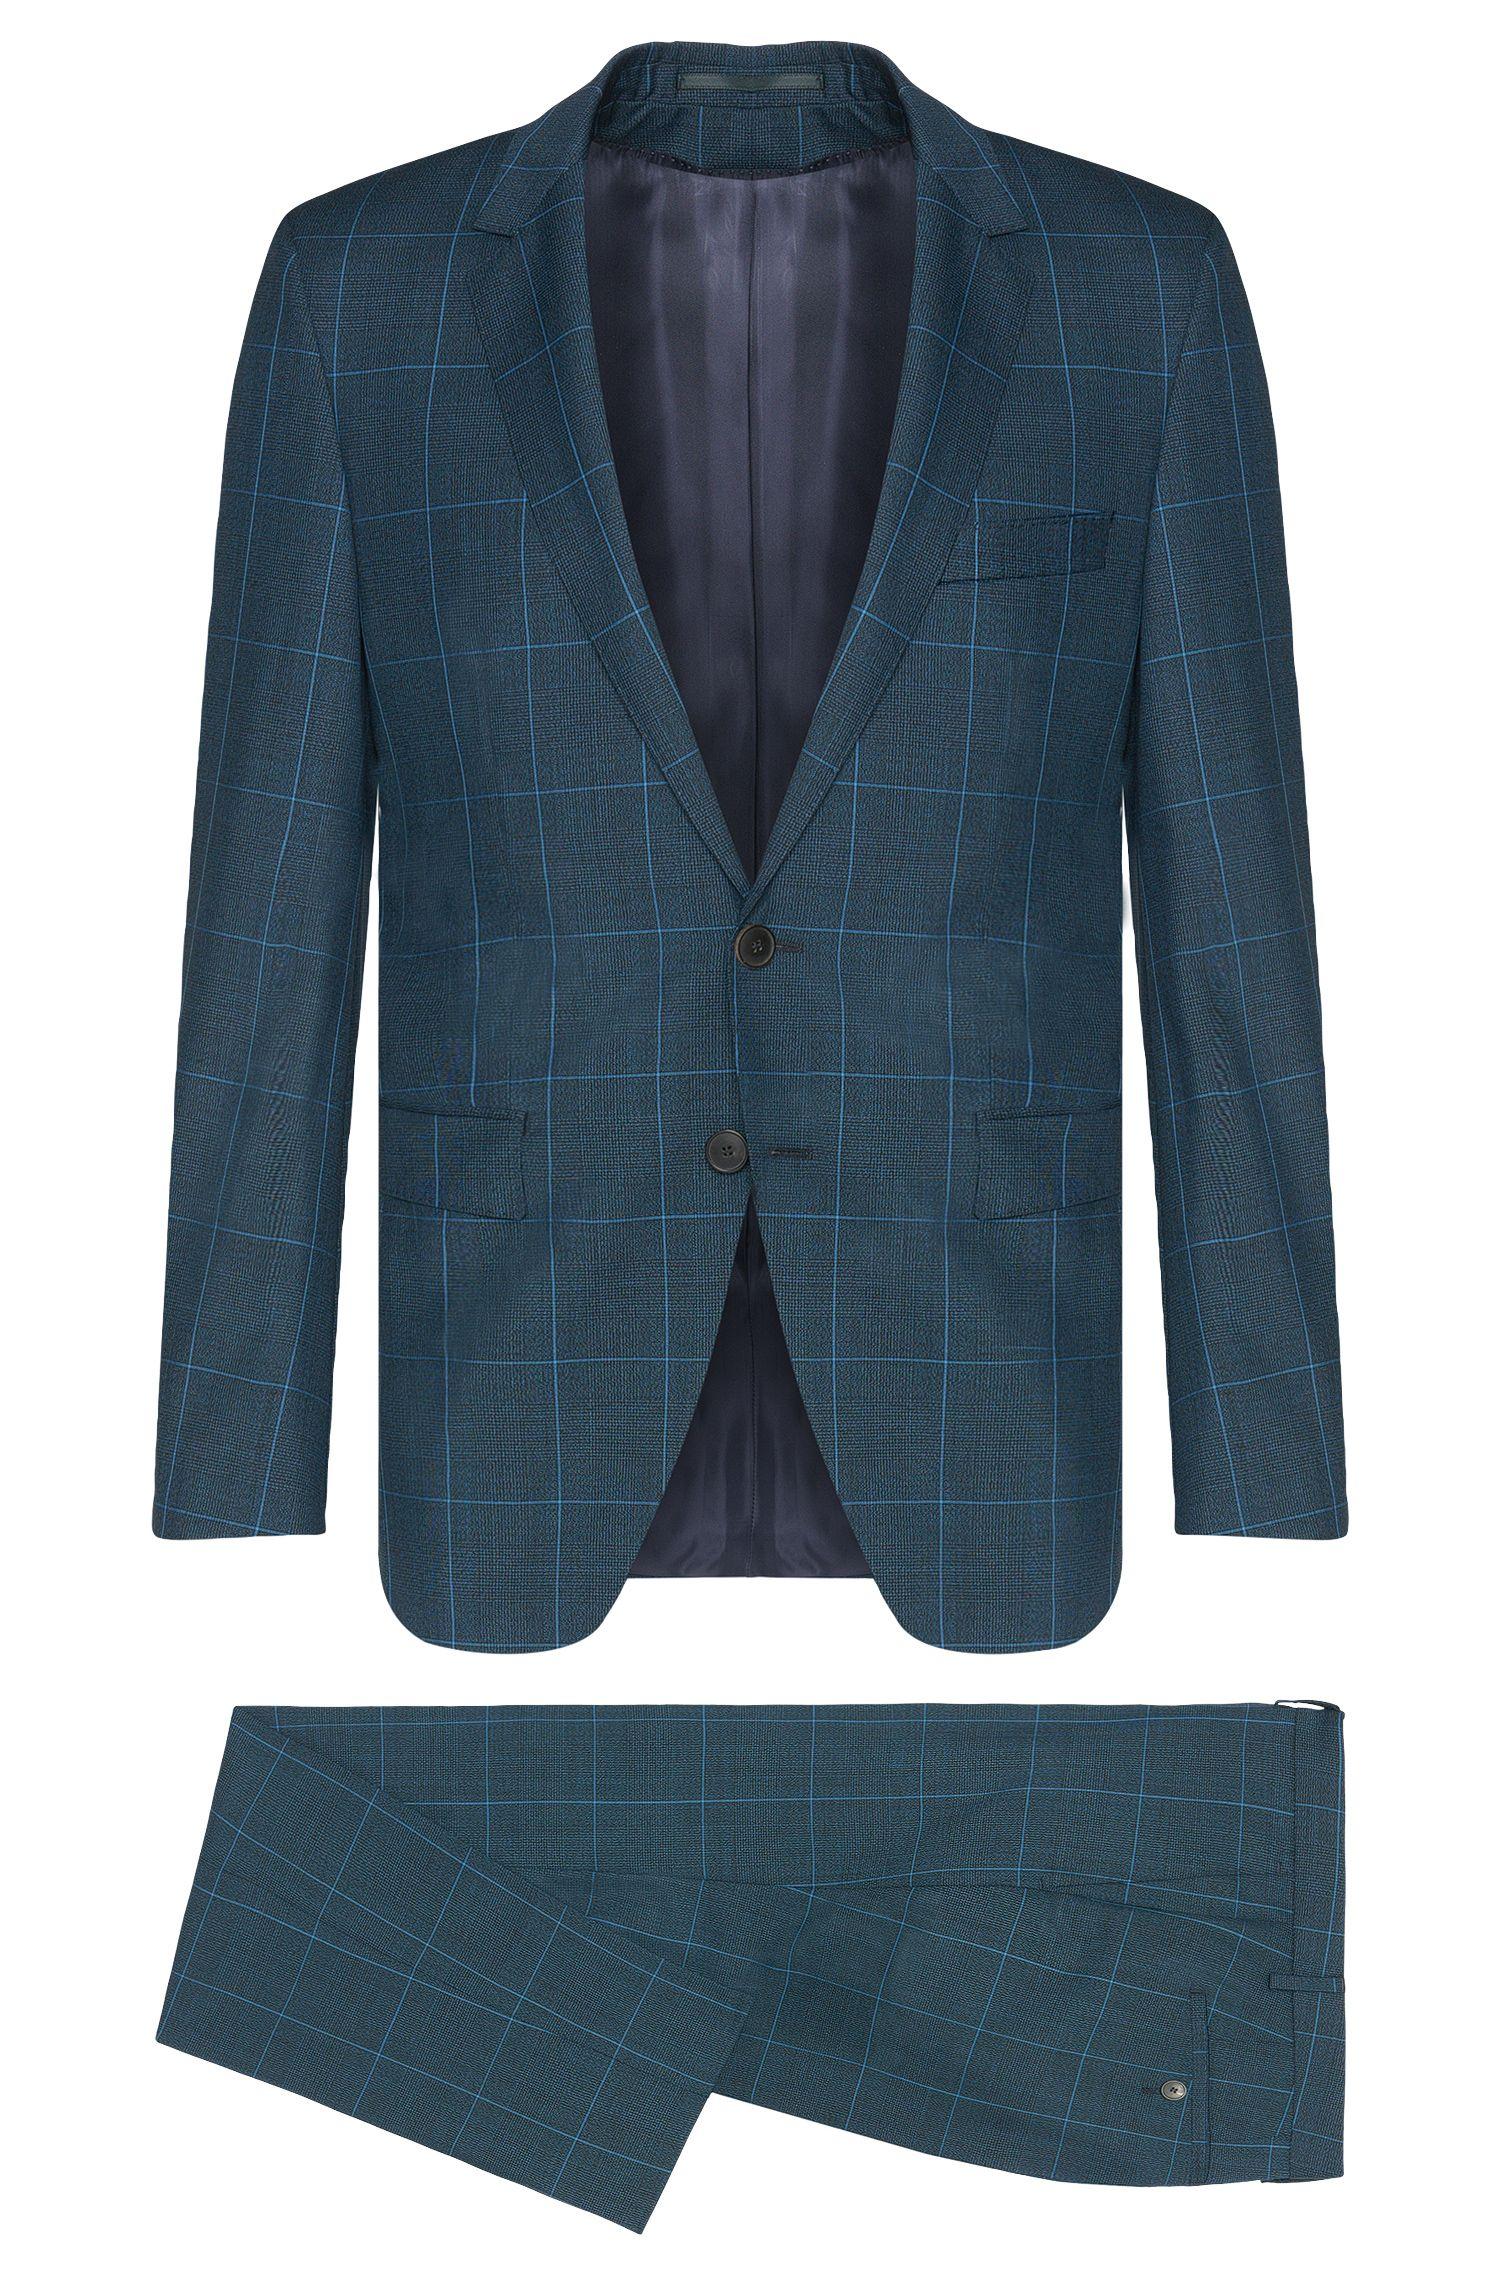 Karierter Extra Slim-Fit Tailored Anzug aus Schurwoll-Mix mit Mohair: 'T-Reeve1/Wain'